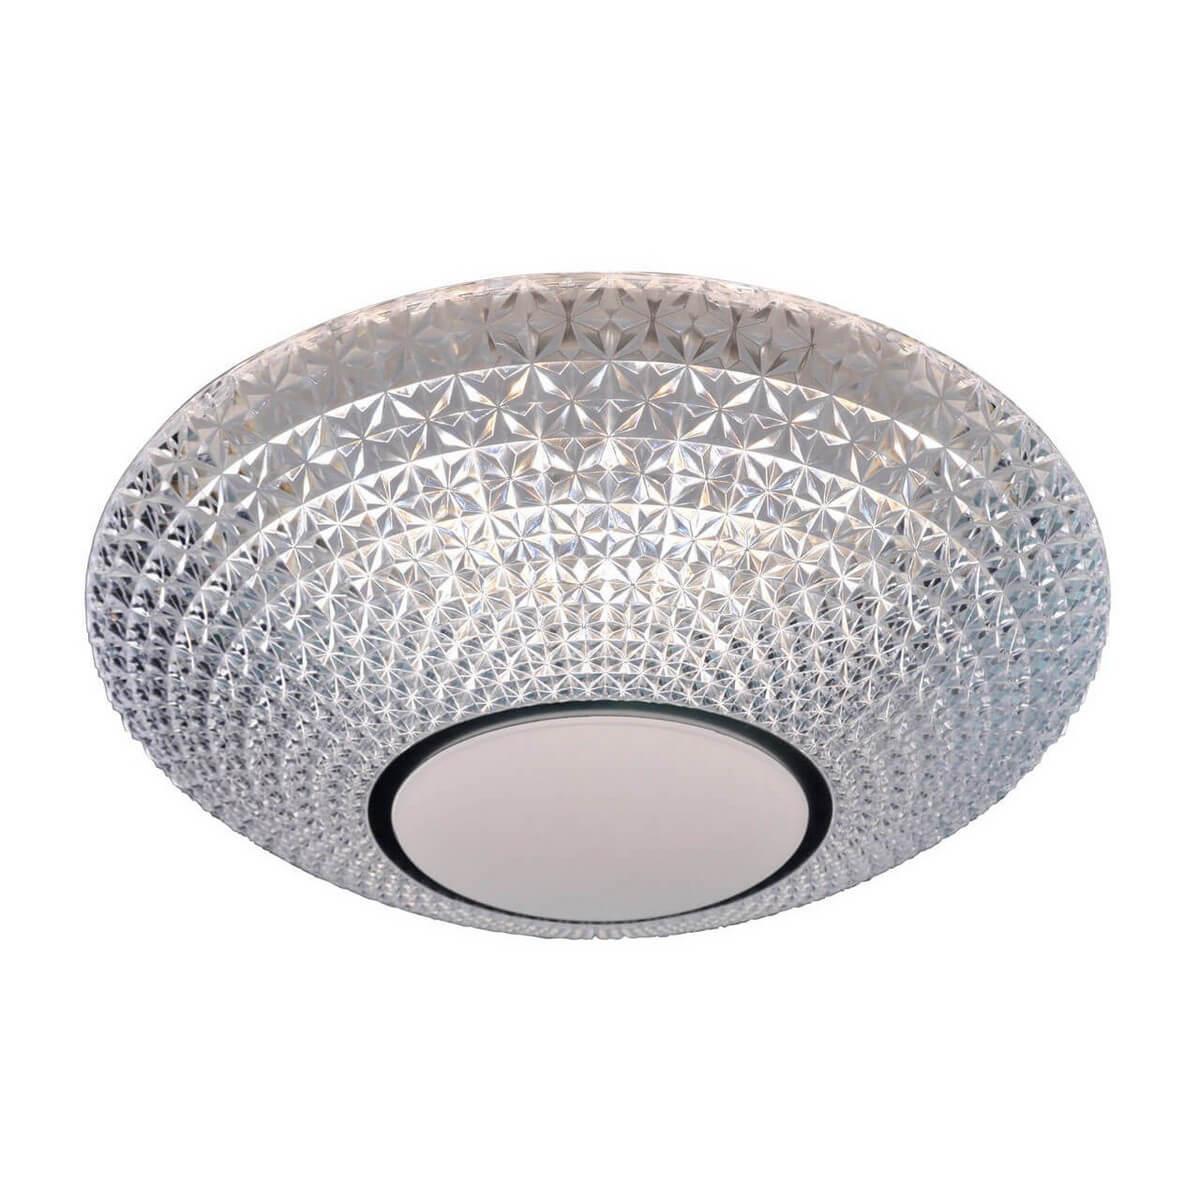 Фото - Накладной светильник Kink Light 074144, LED, 36 Вт накладной светильник kink light фейерверк 08013